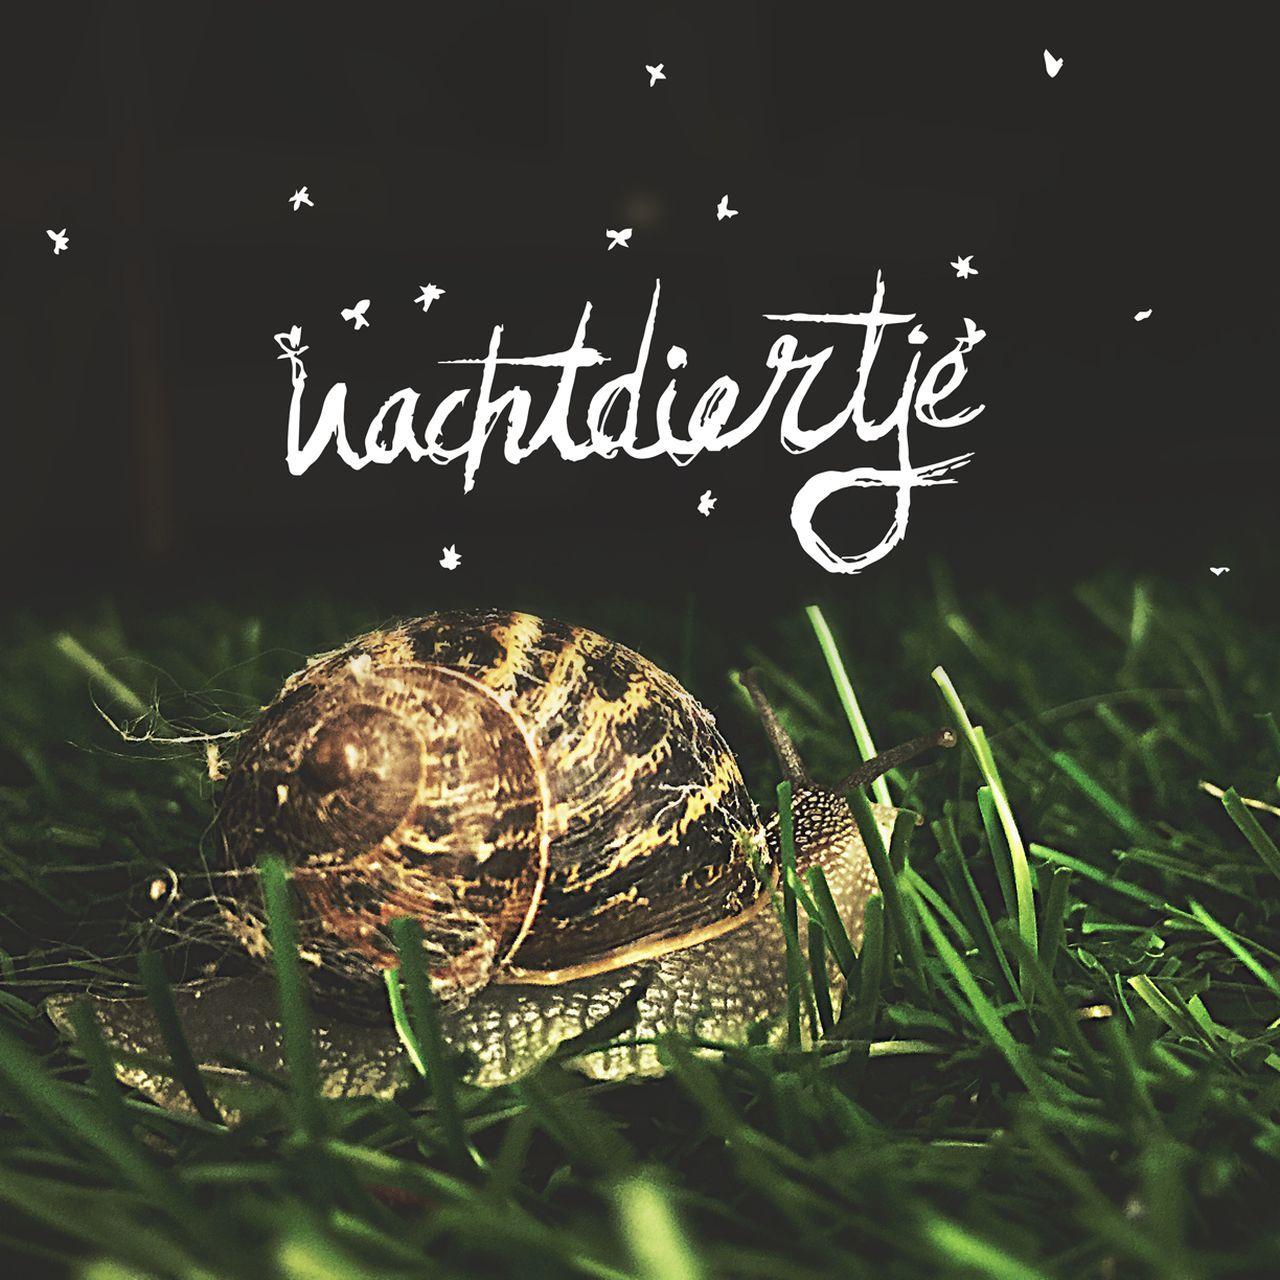 Nachtdier Vlissingen Tuin Gras  Slak Nacht Sterren Typography TYPOGRAFIE Tentypografie